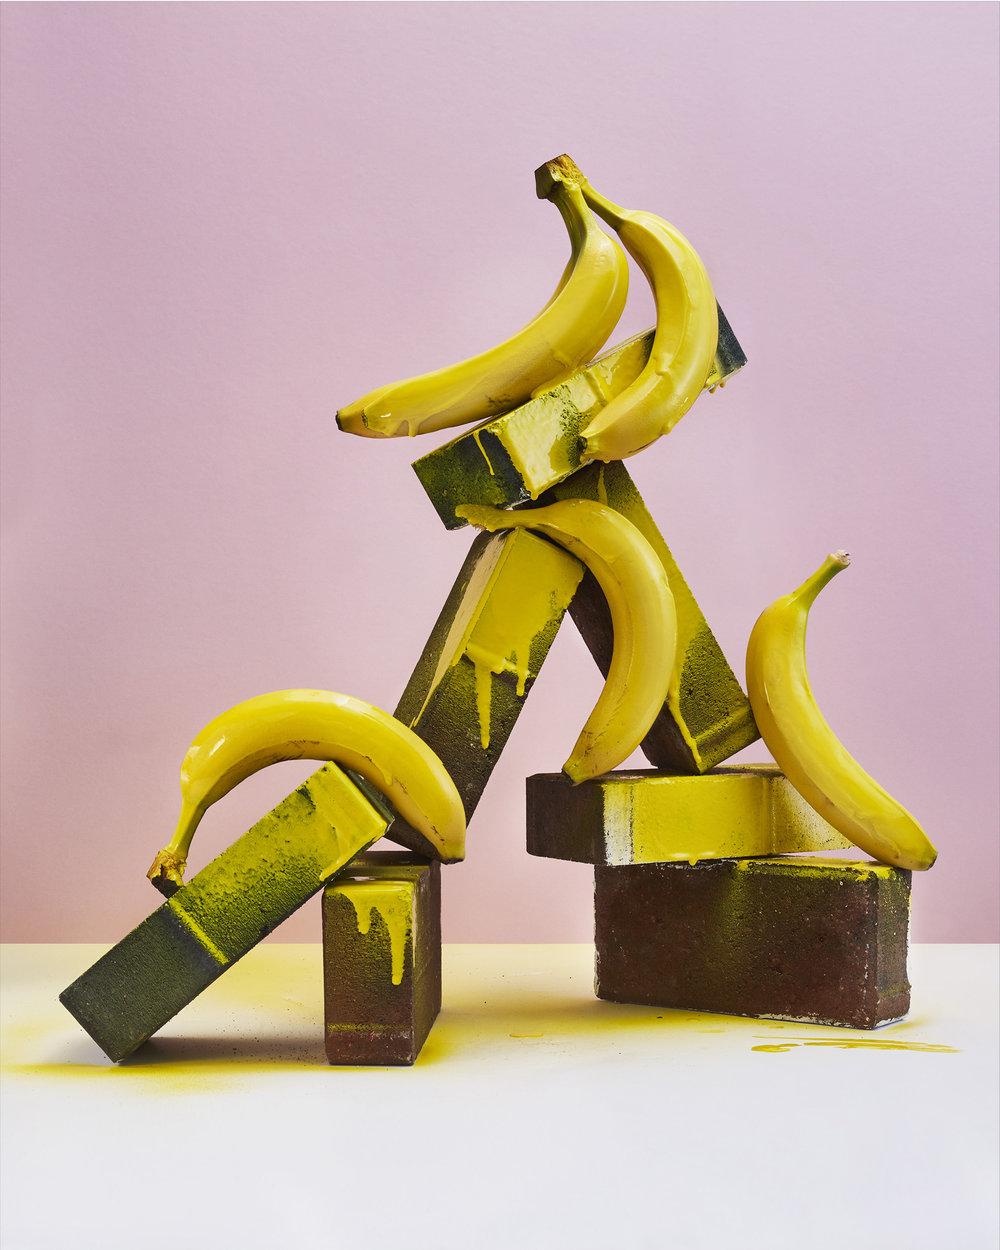 bananas_15A7485.jpg